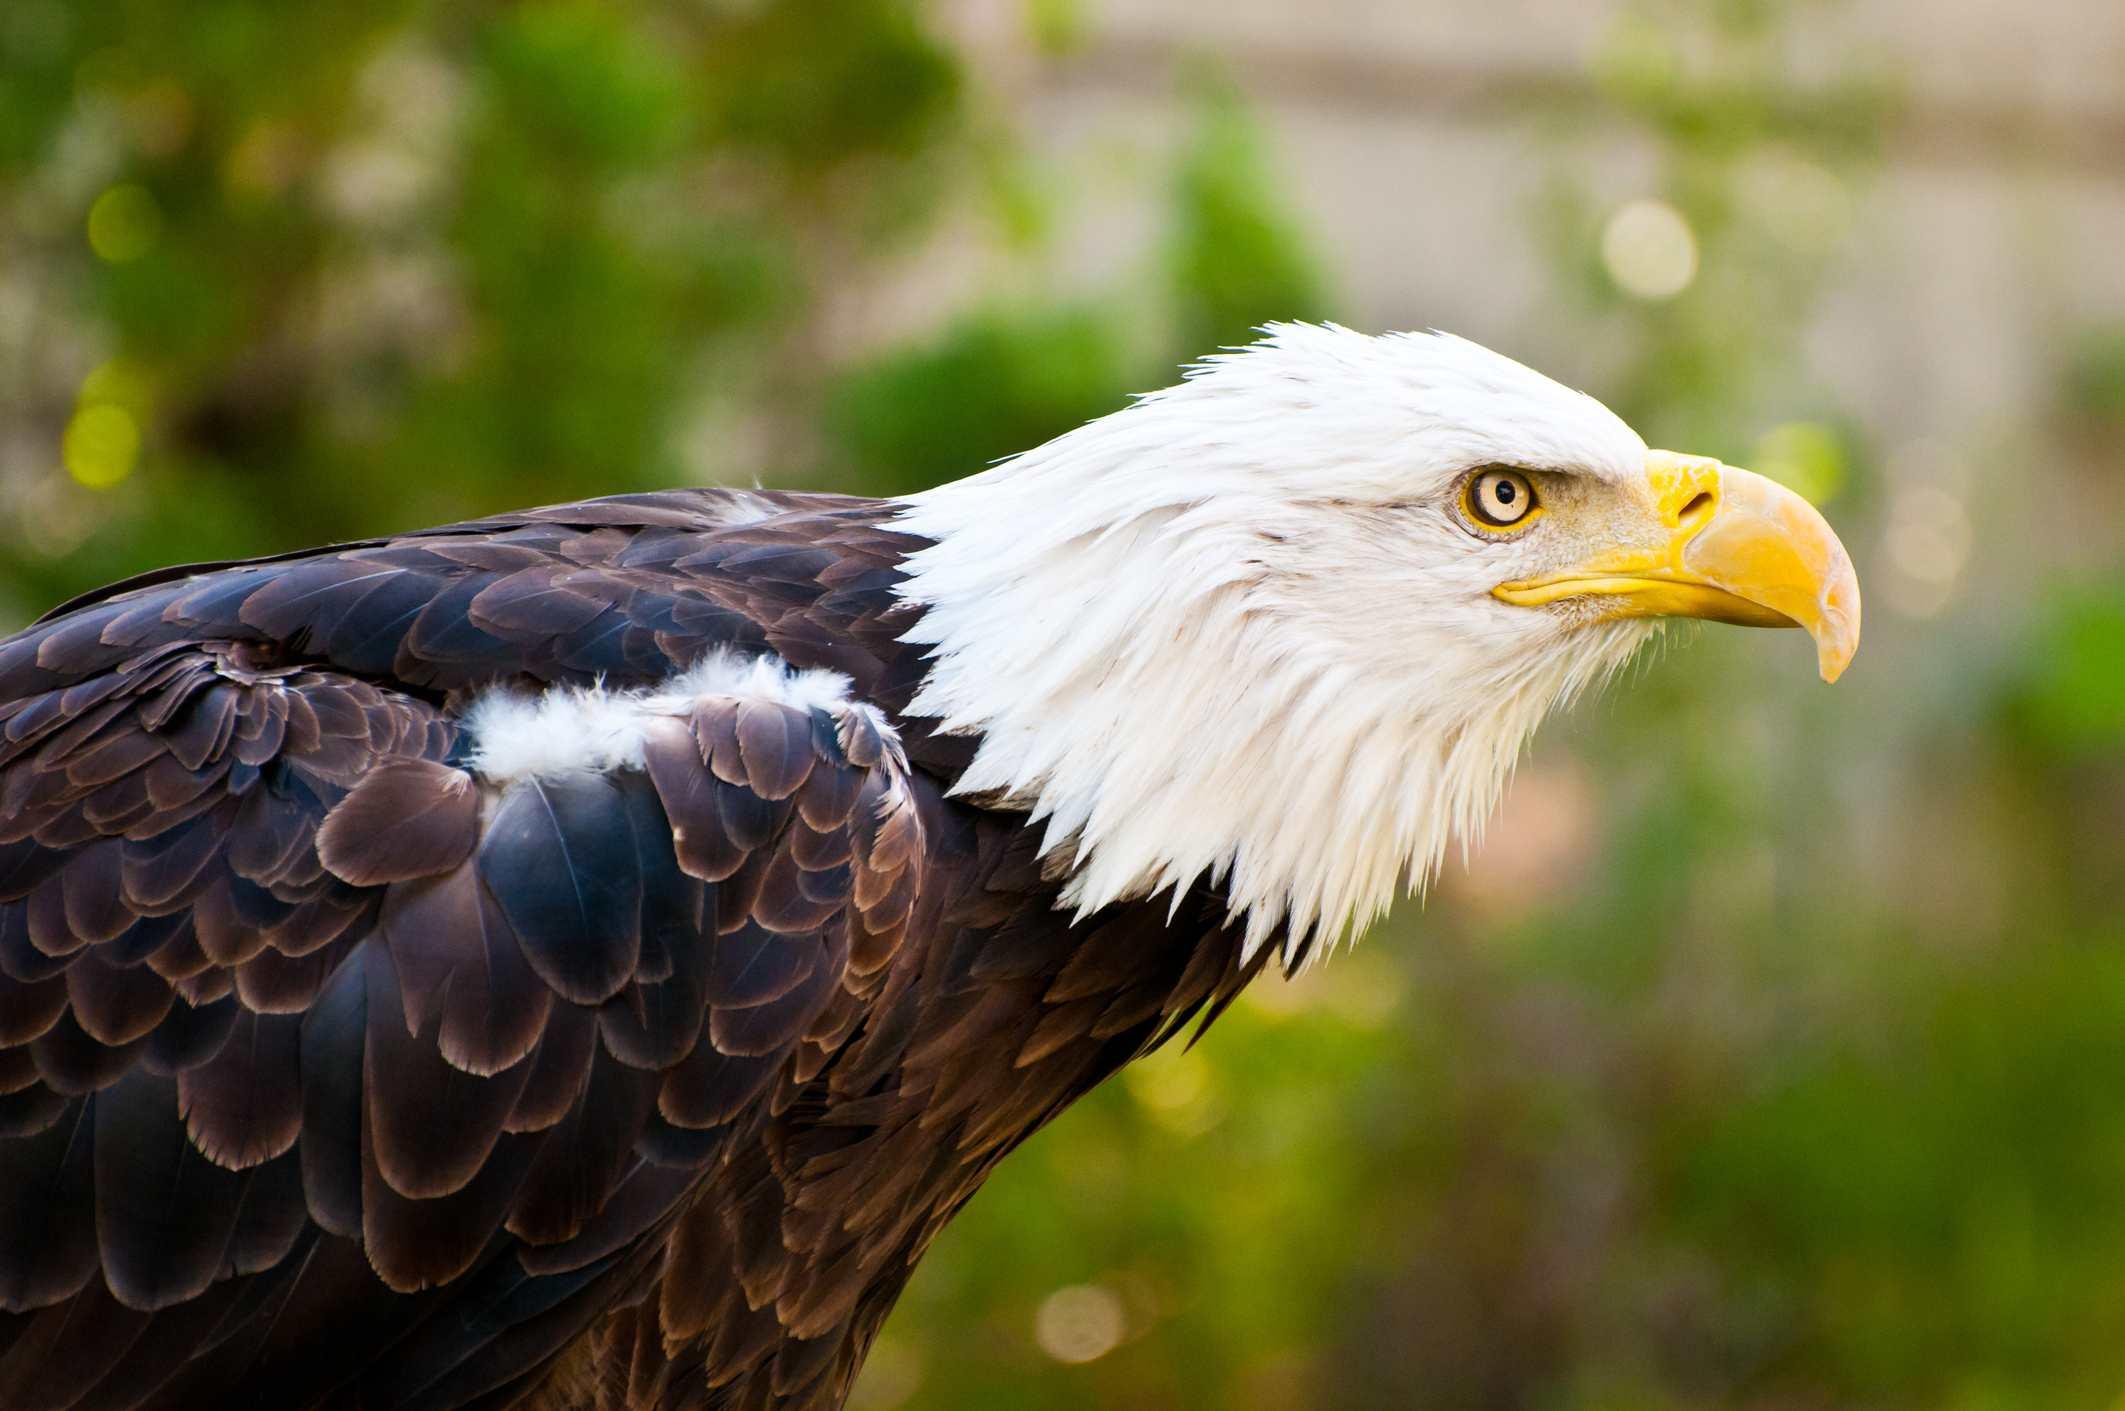 Hogle zoo Bald Eagle